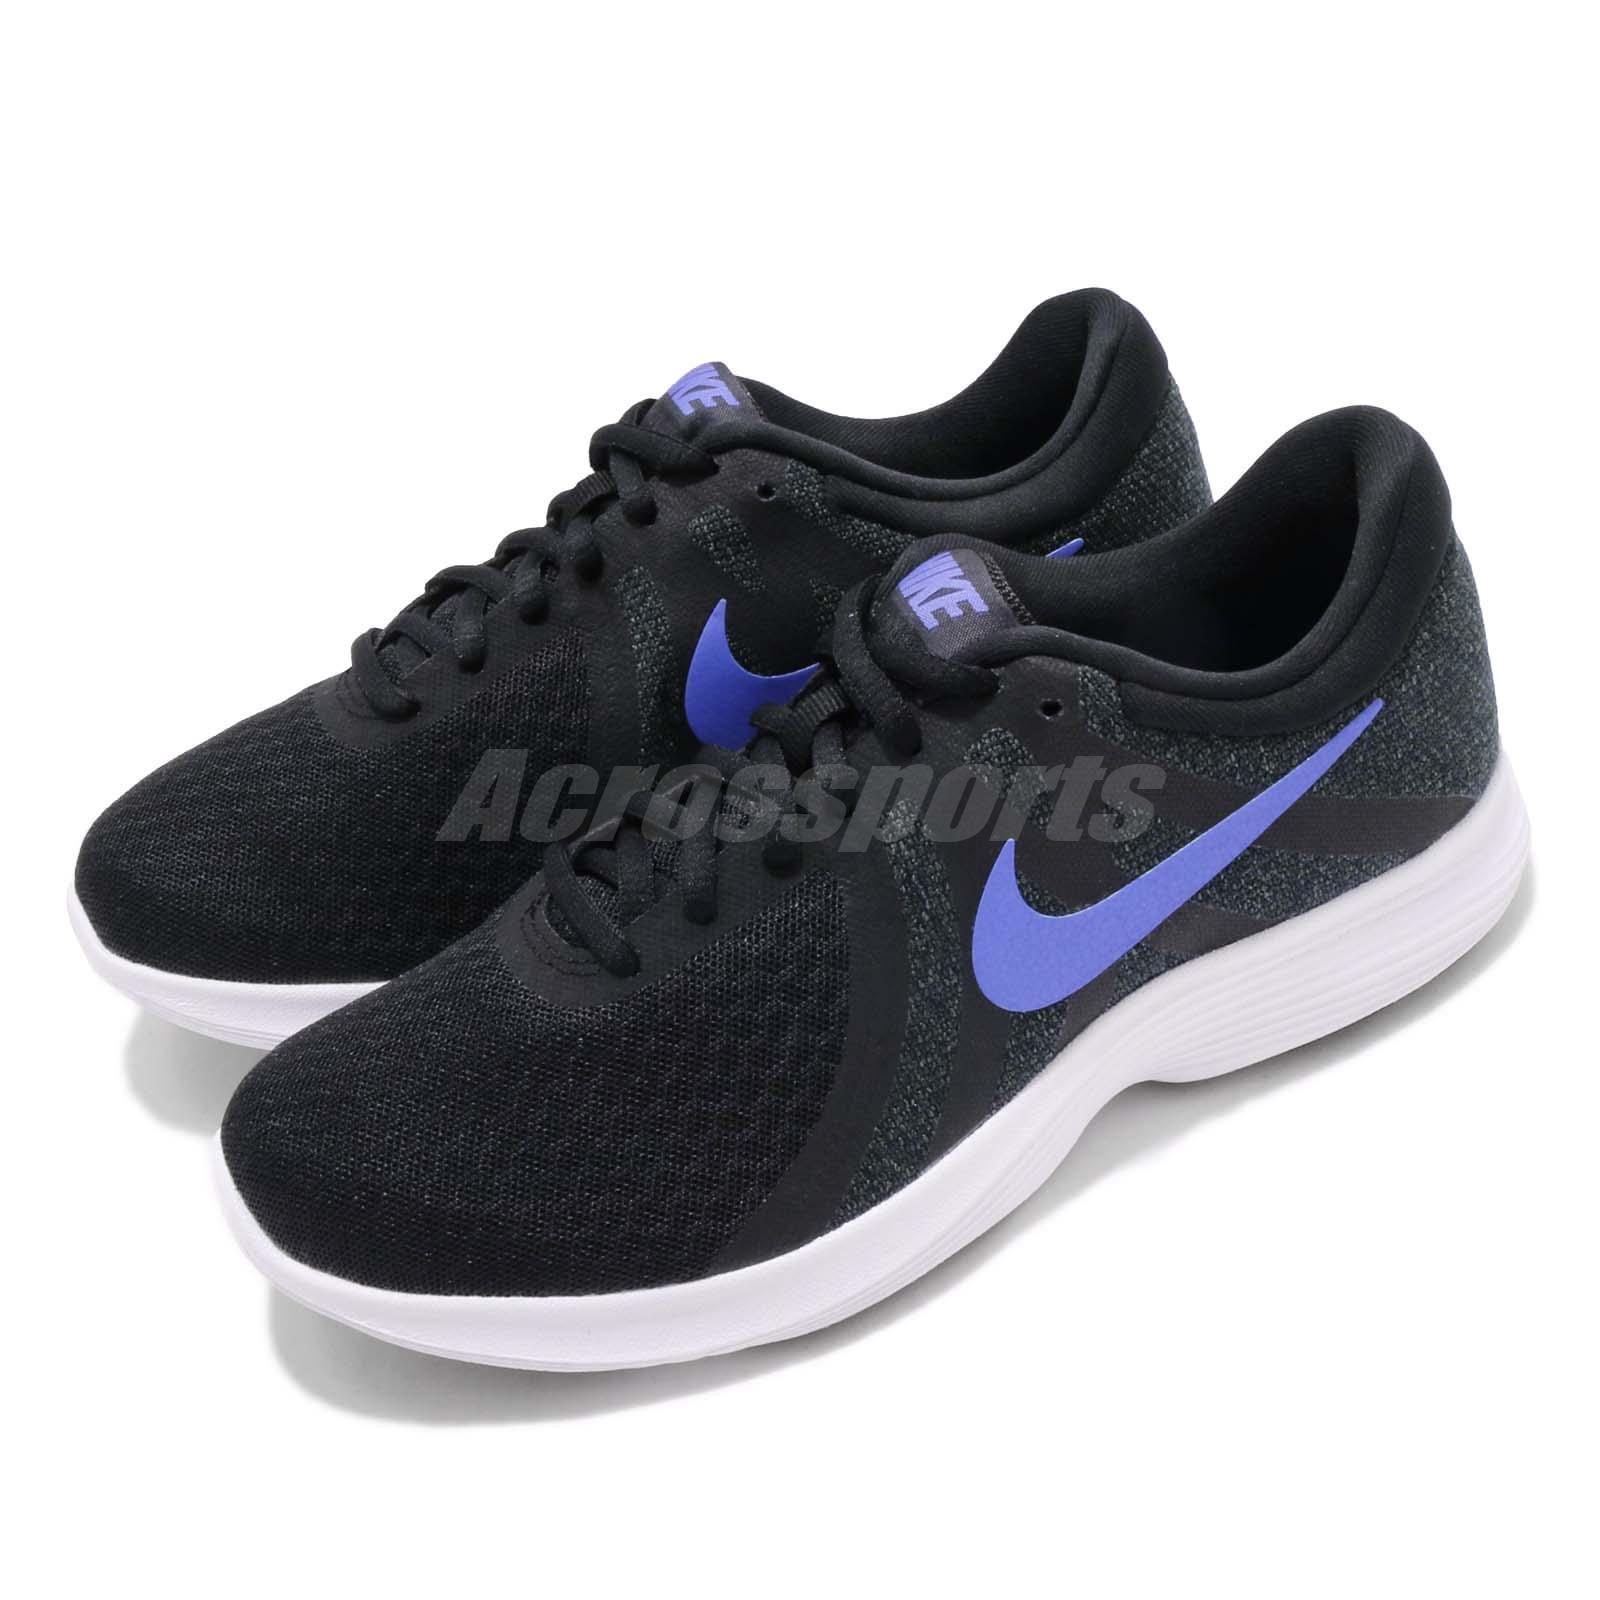 faf6487515eb Nike Wmns Revolution 4 Black Sapphire White Women Running Shoes ...